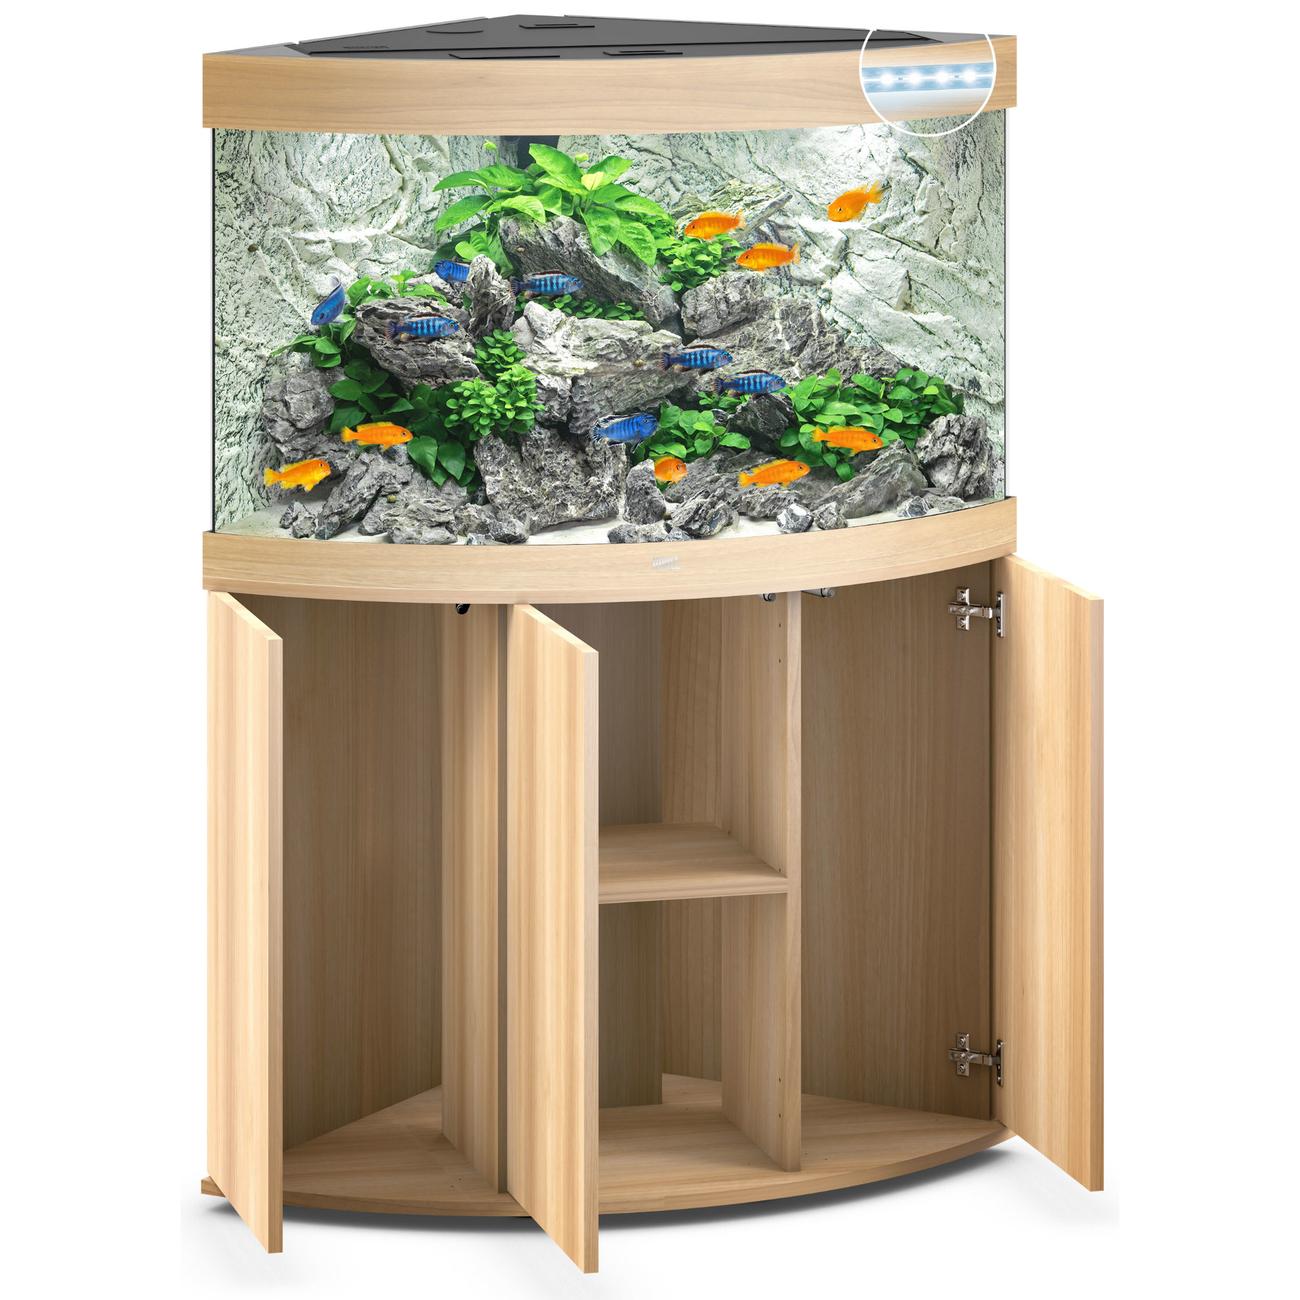 Juwel Trigon 190 LED Eck-Aquarium mit Unterschrank, Bild 12